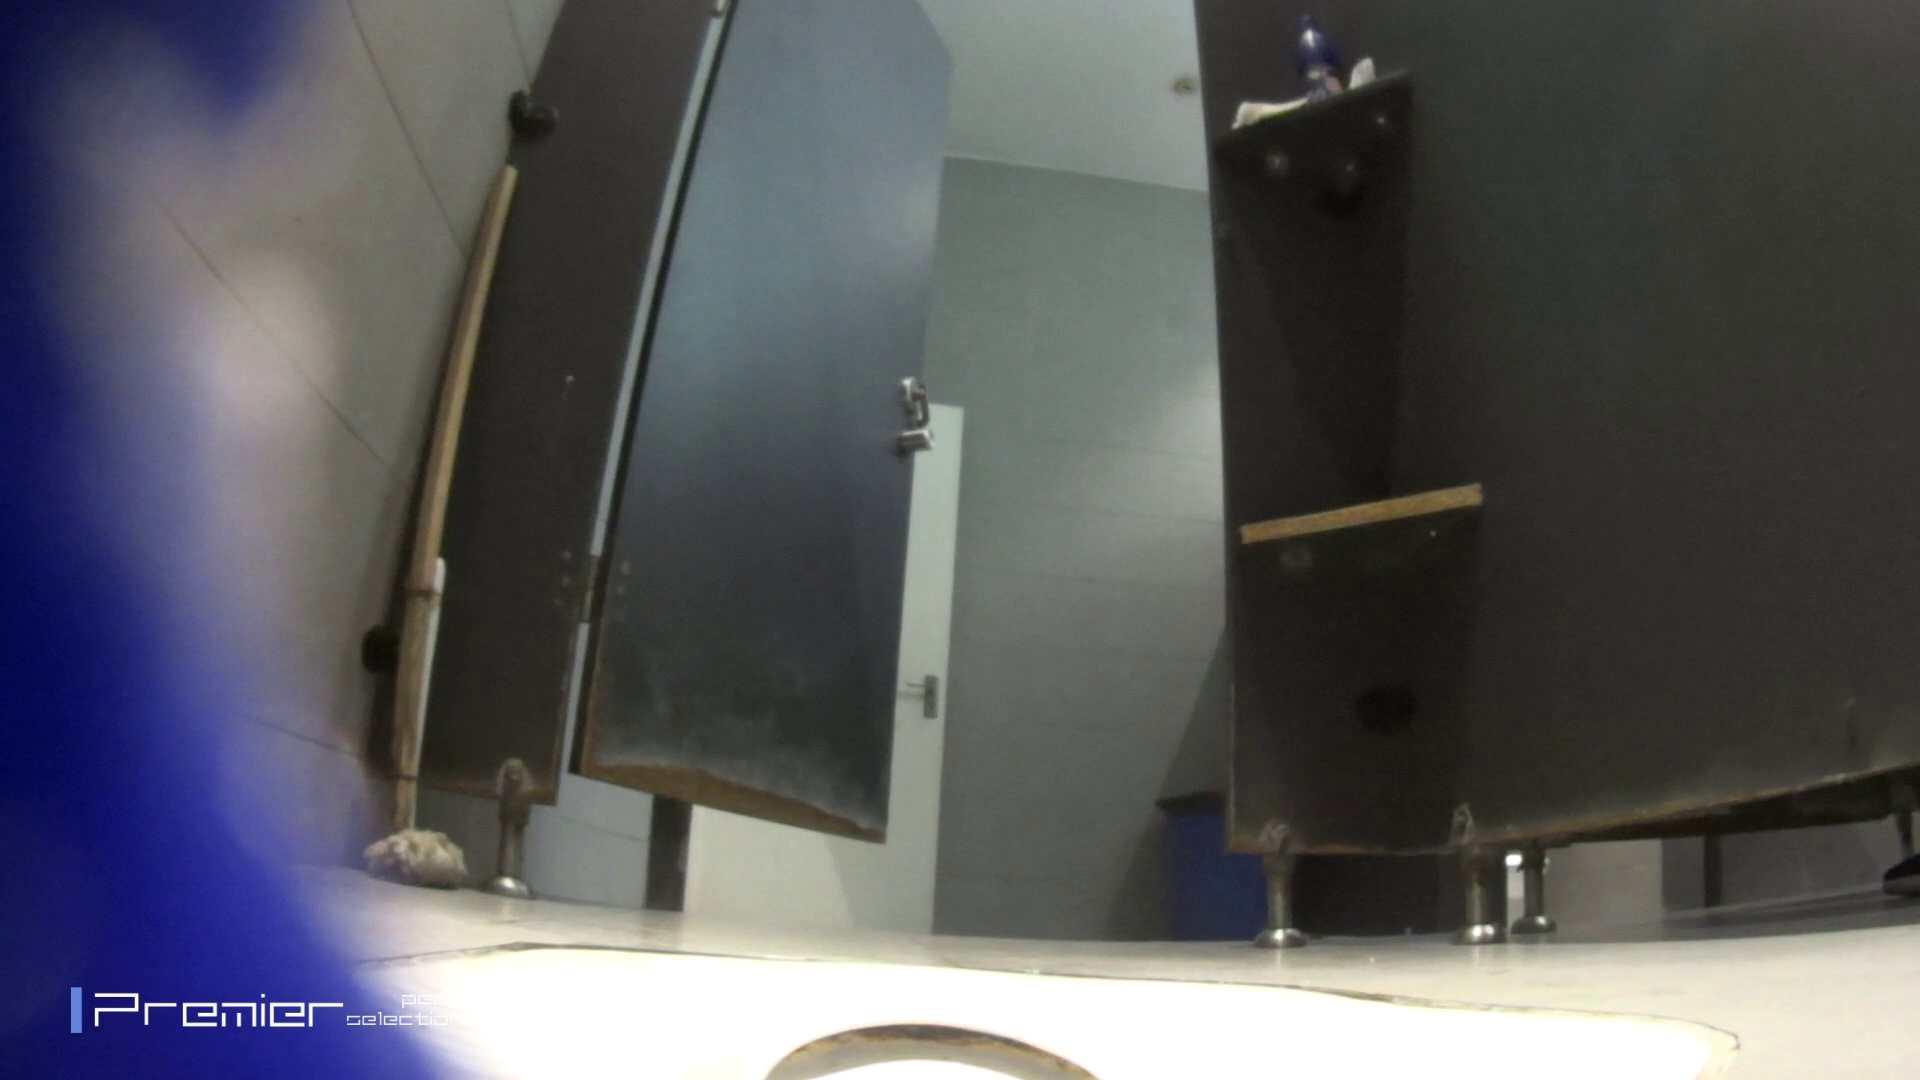 色白美女の洗面所 大学休憩時間の洗面所事情51 ギャル達 スケベ動画紹介 86枚 2